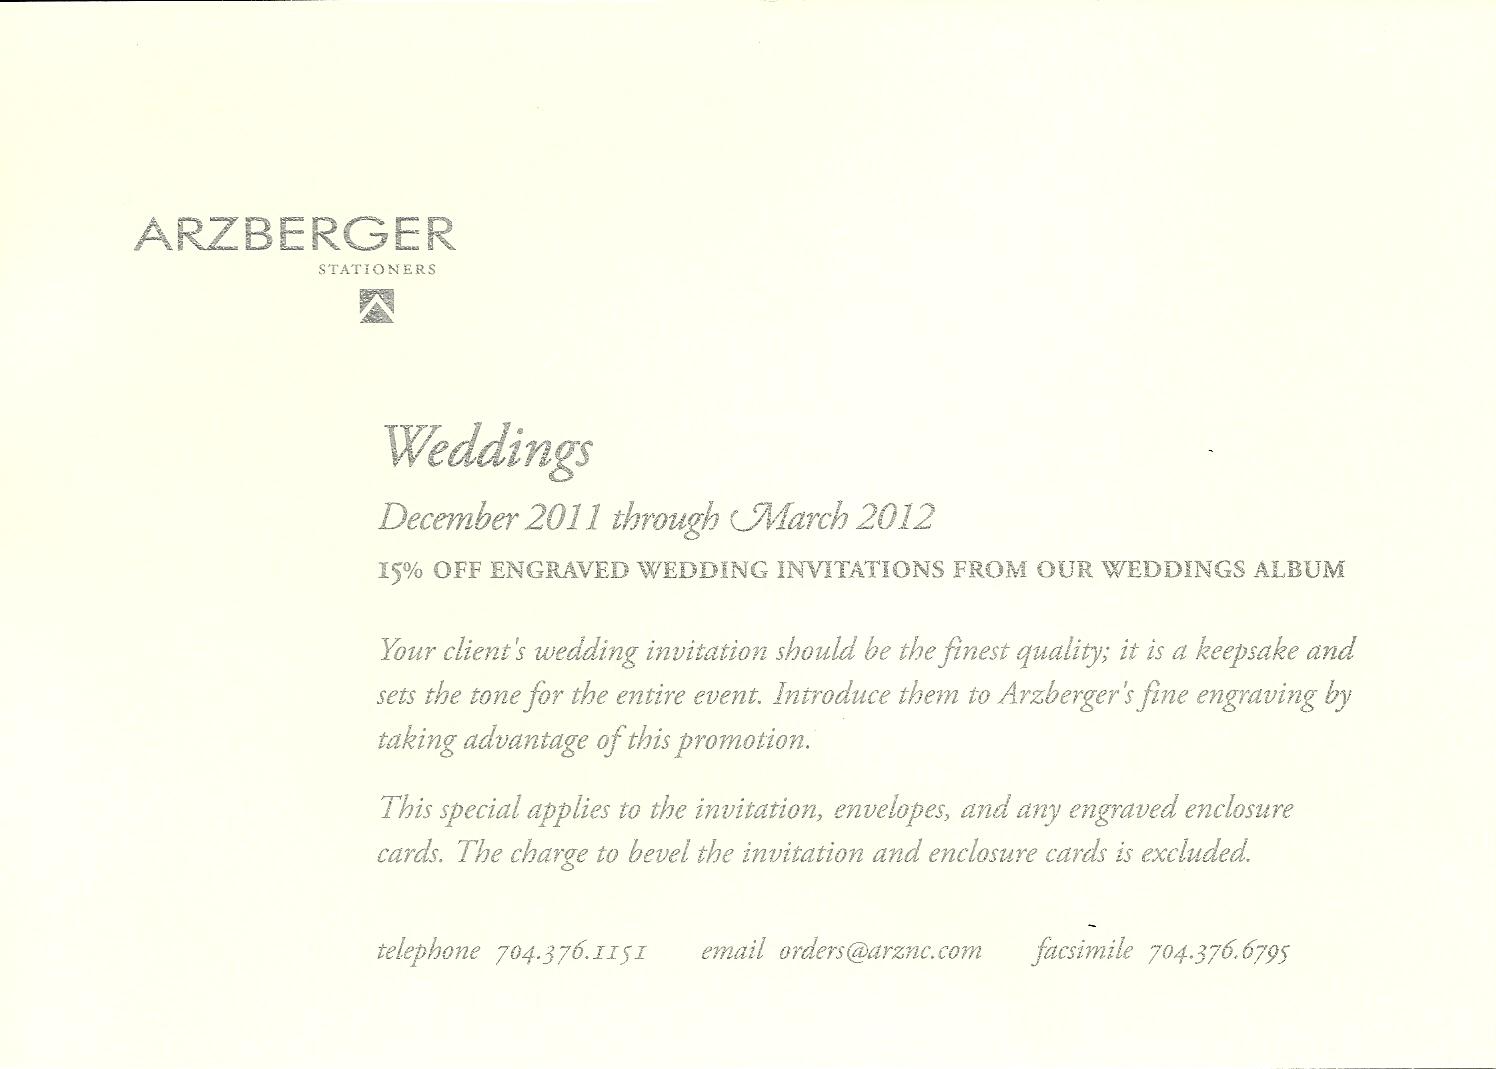 Hayden Avery Fine Stationery: Wedding Invitation Sale